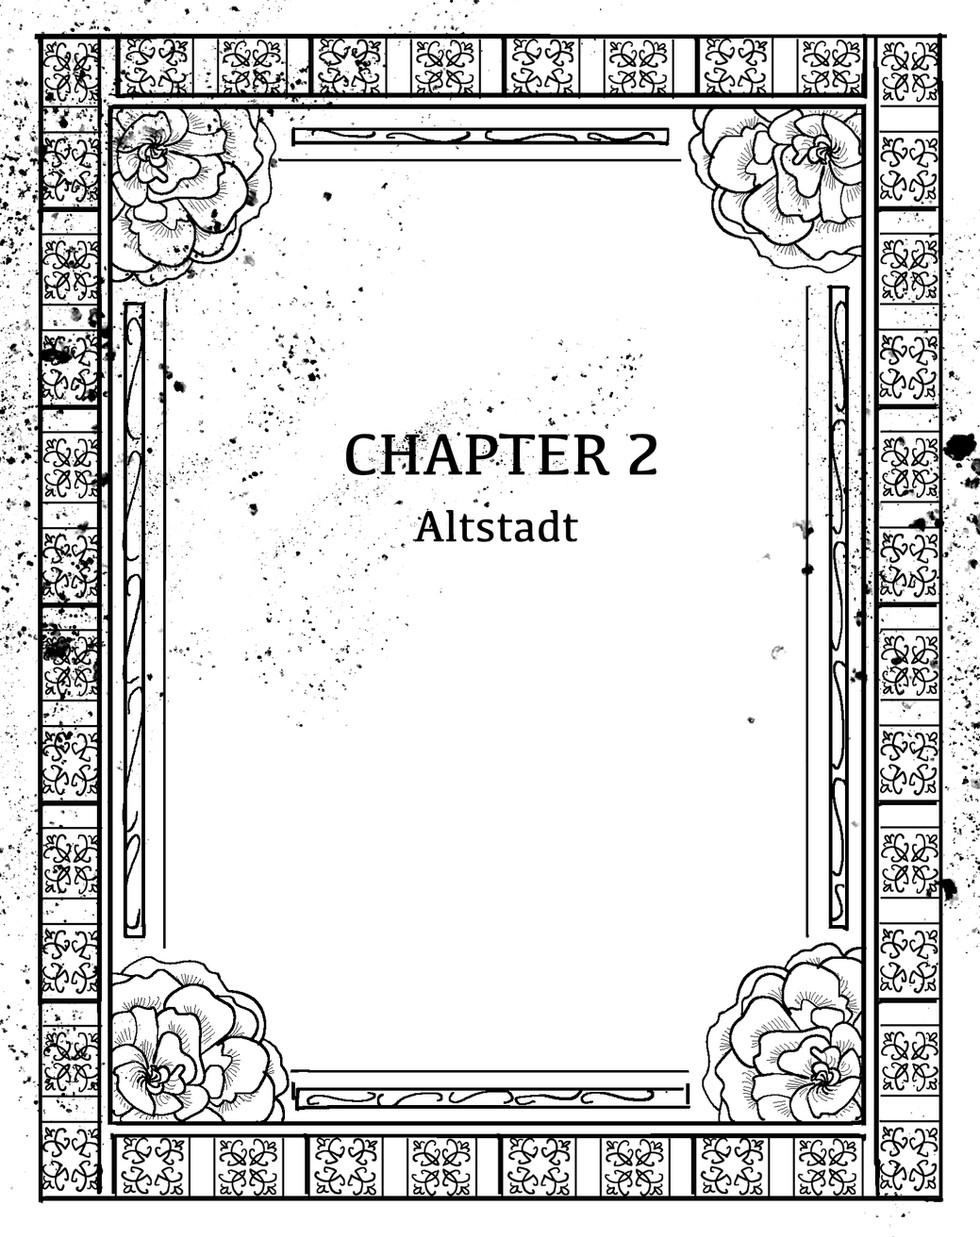 Amnesia_ChapterCard_2.jpg